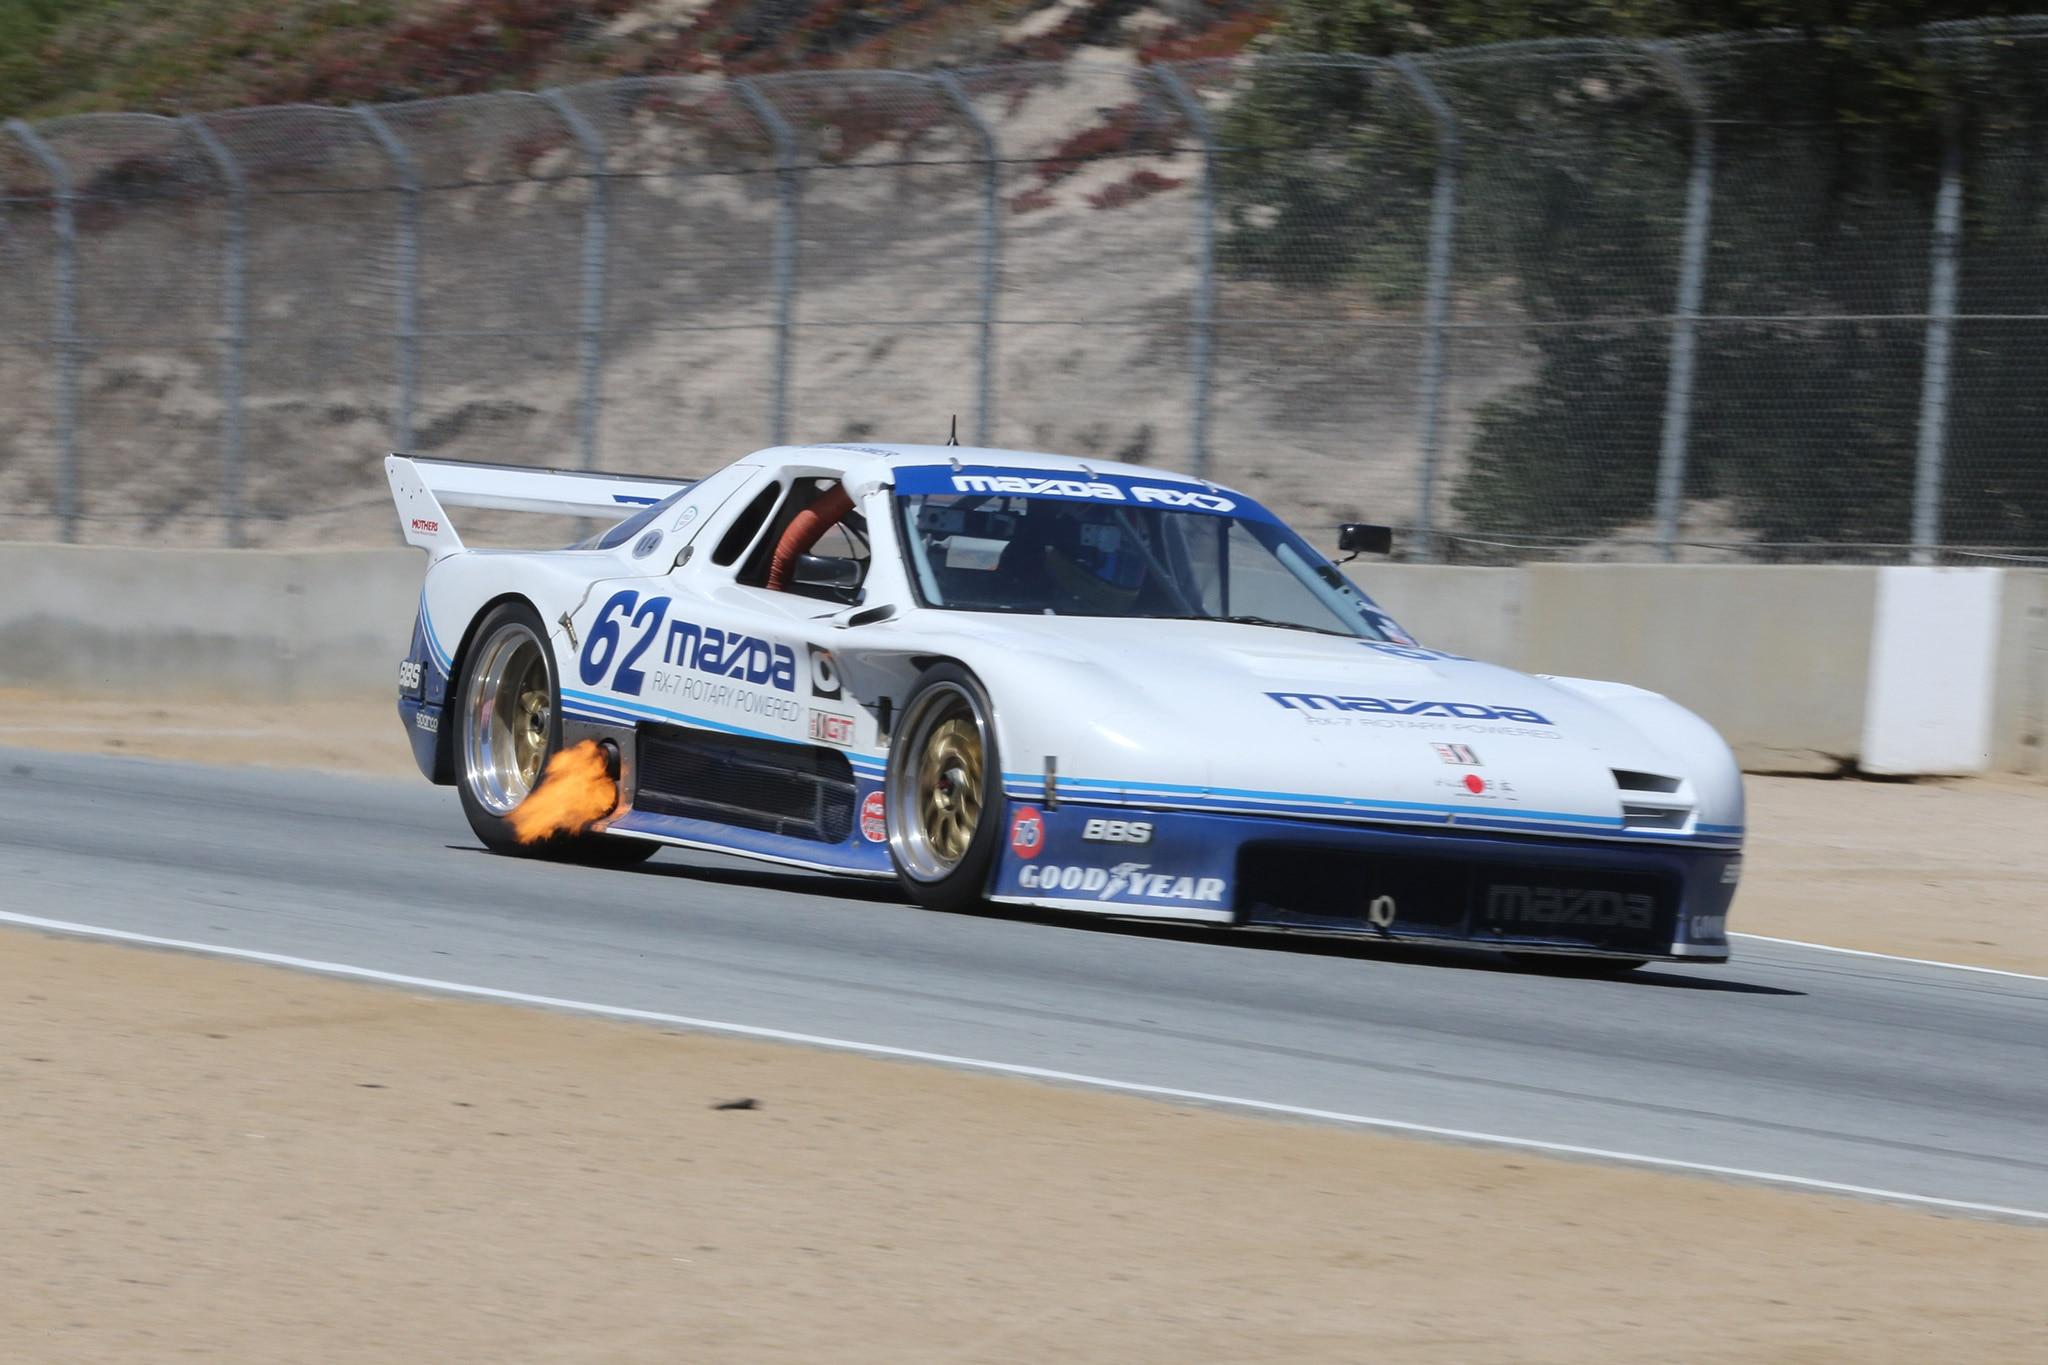 A Video Ride Around Laguna Seca in a Mazda IMSA RX-7 GTO ...